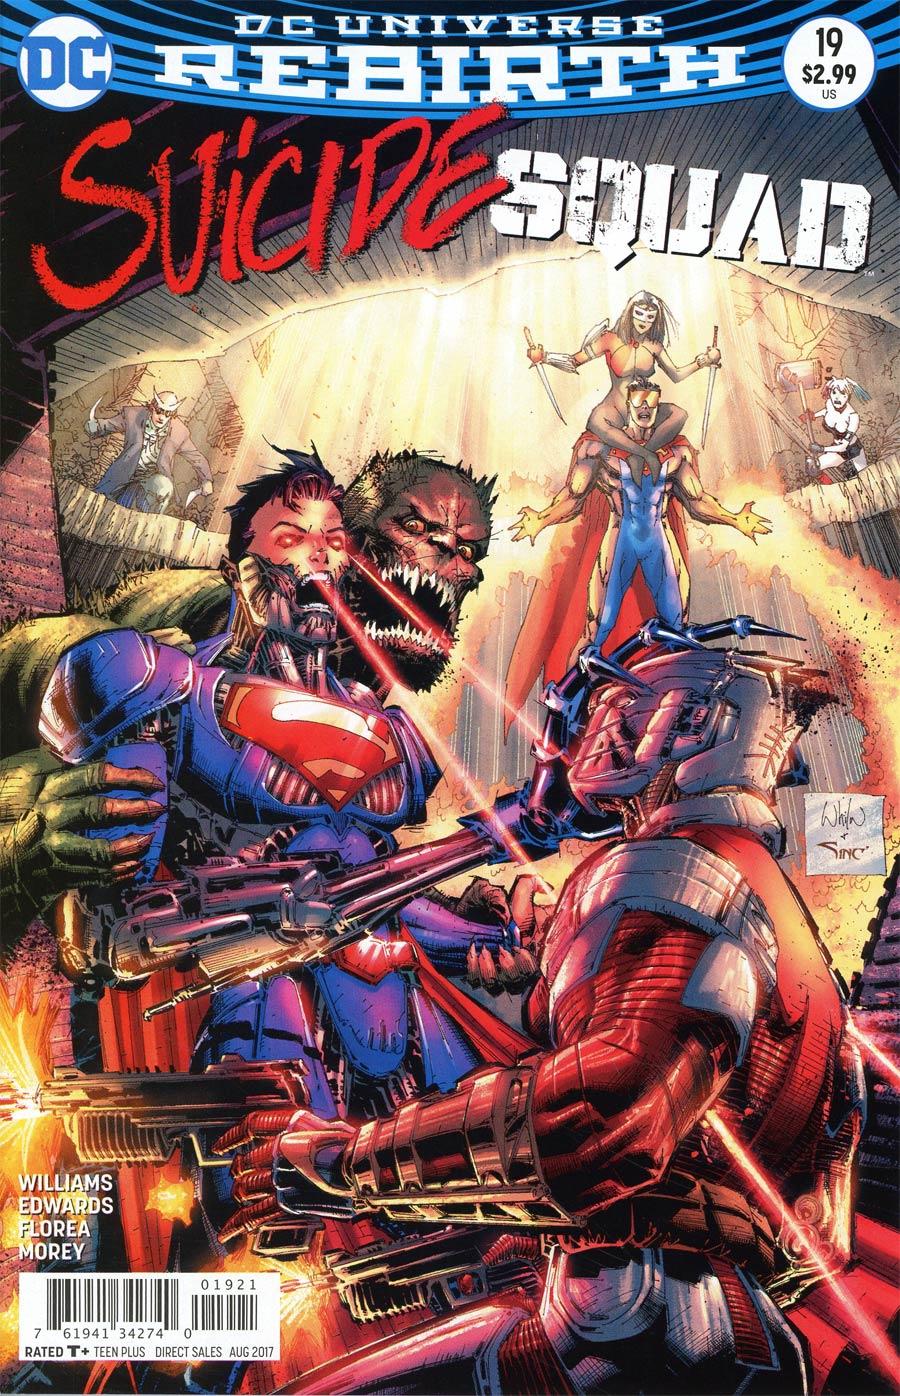 Suicide Squad Vol 4 #19 Cover B Variant Whilce Portacio Cover